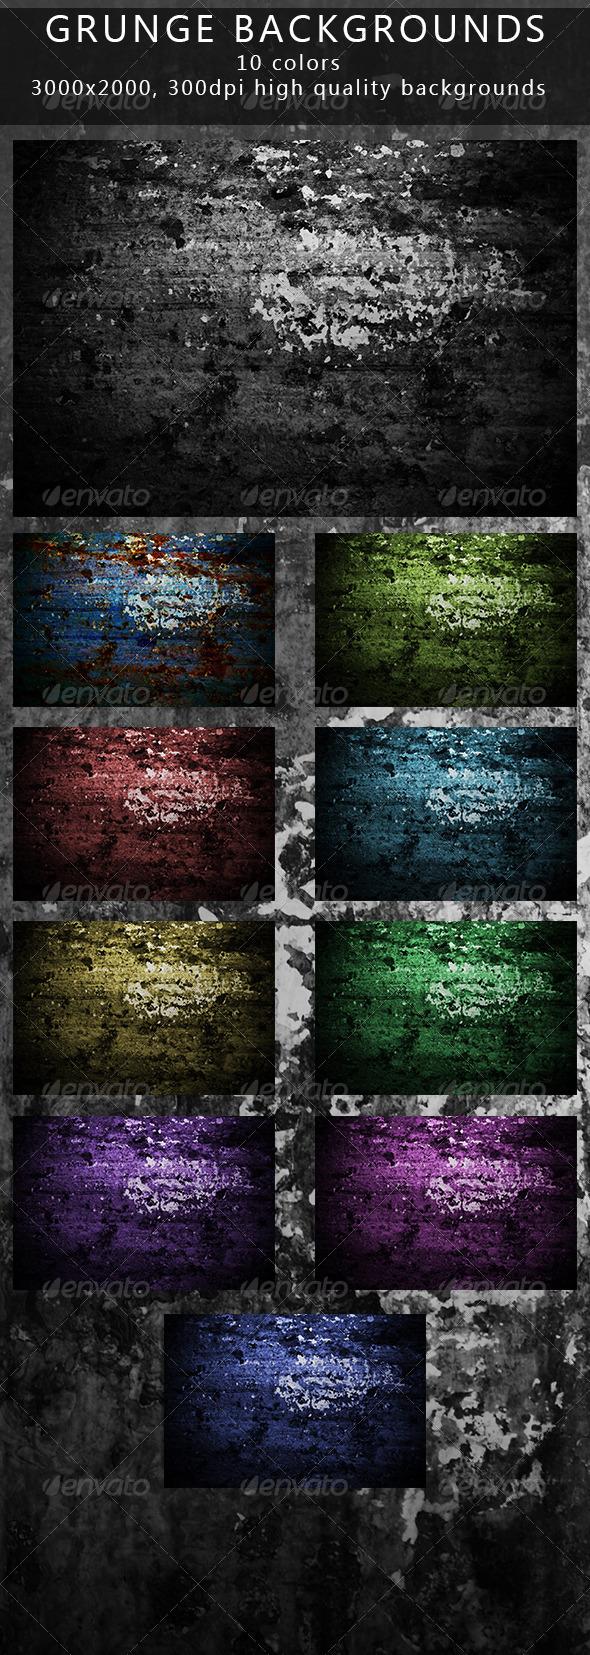 Grunge Backgrounds - Urban Backgrounds